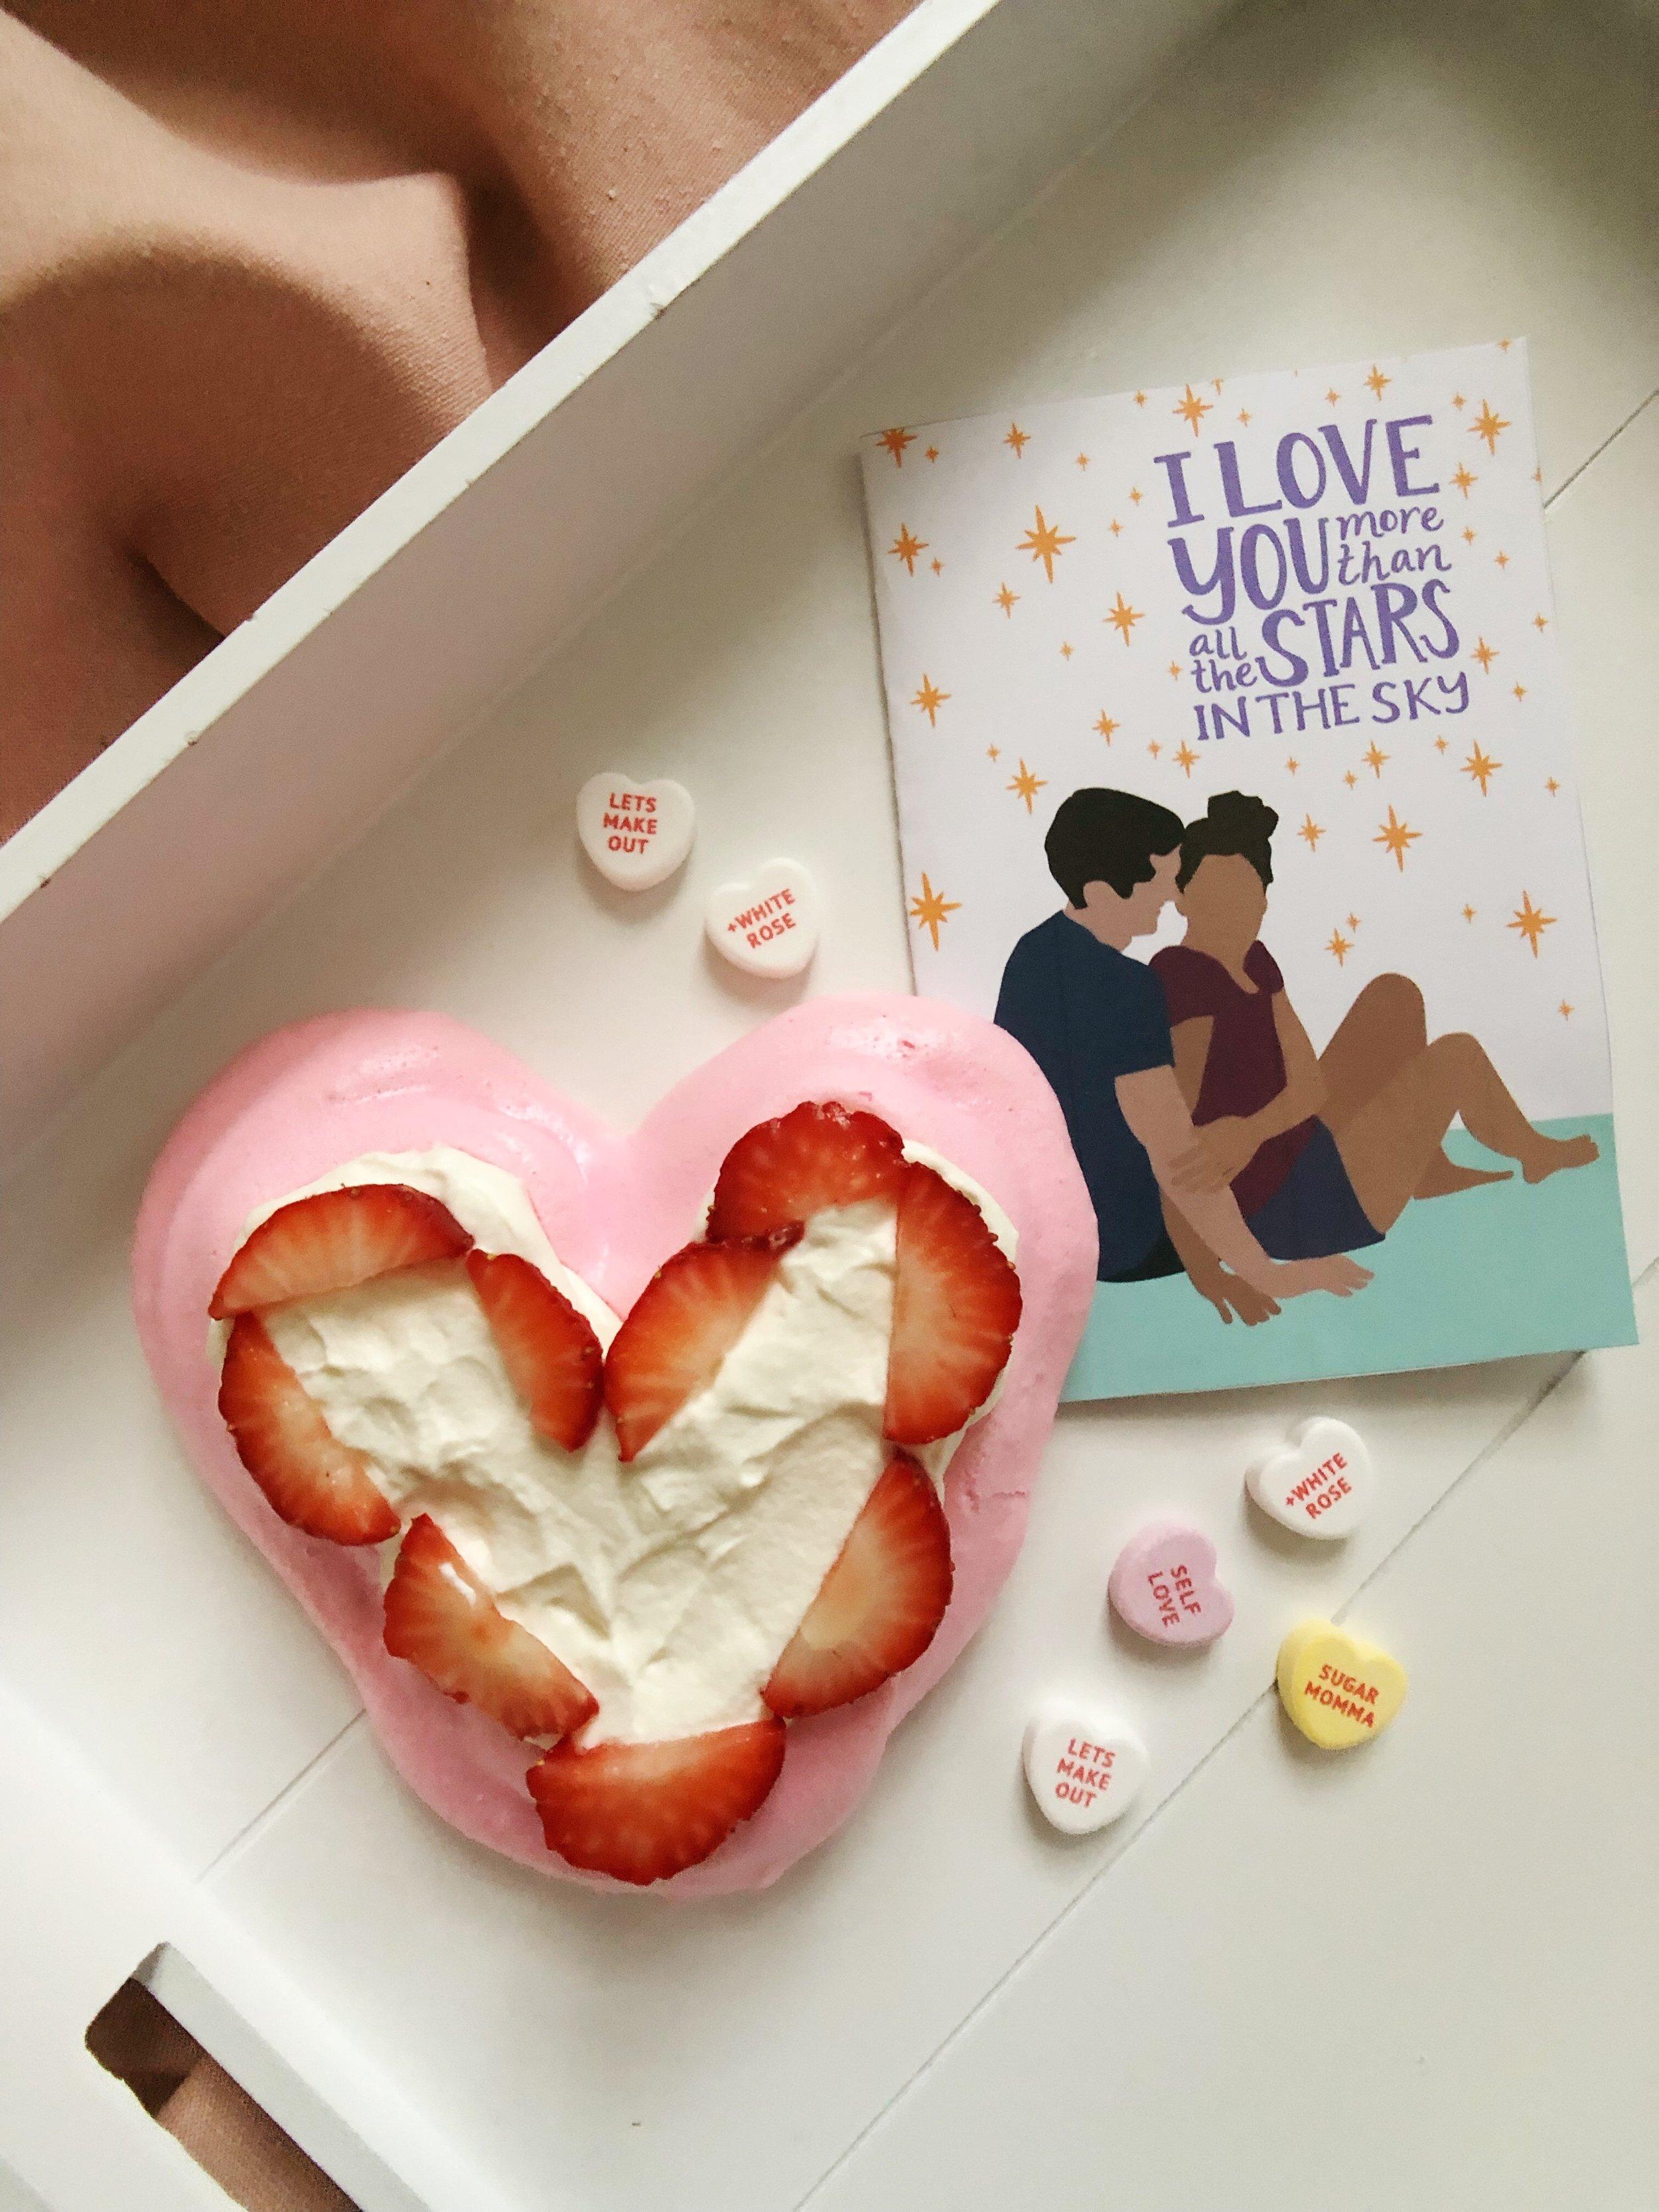 Heart-valentines-day-pavlova-dessert-pink-recipe-baking-food